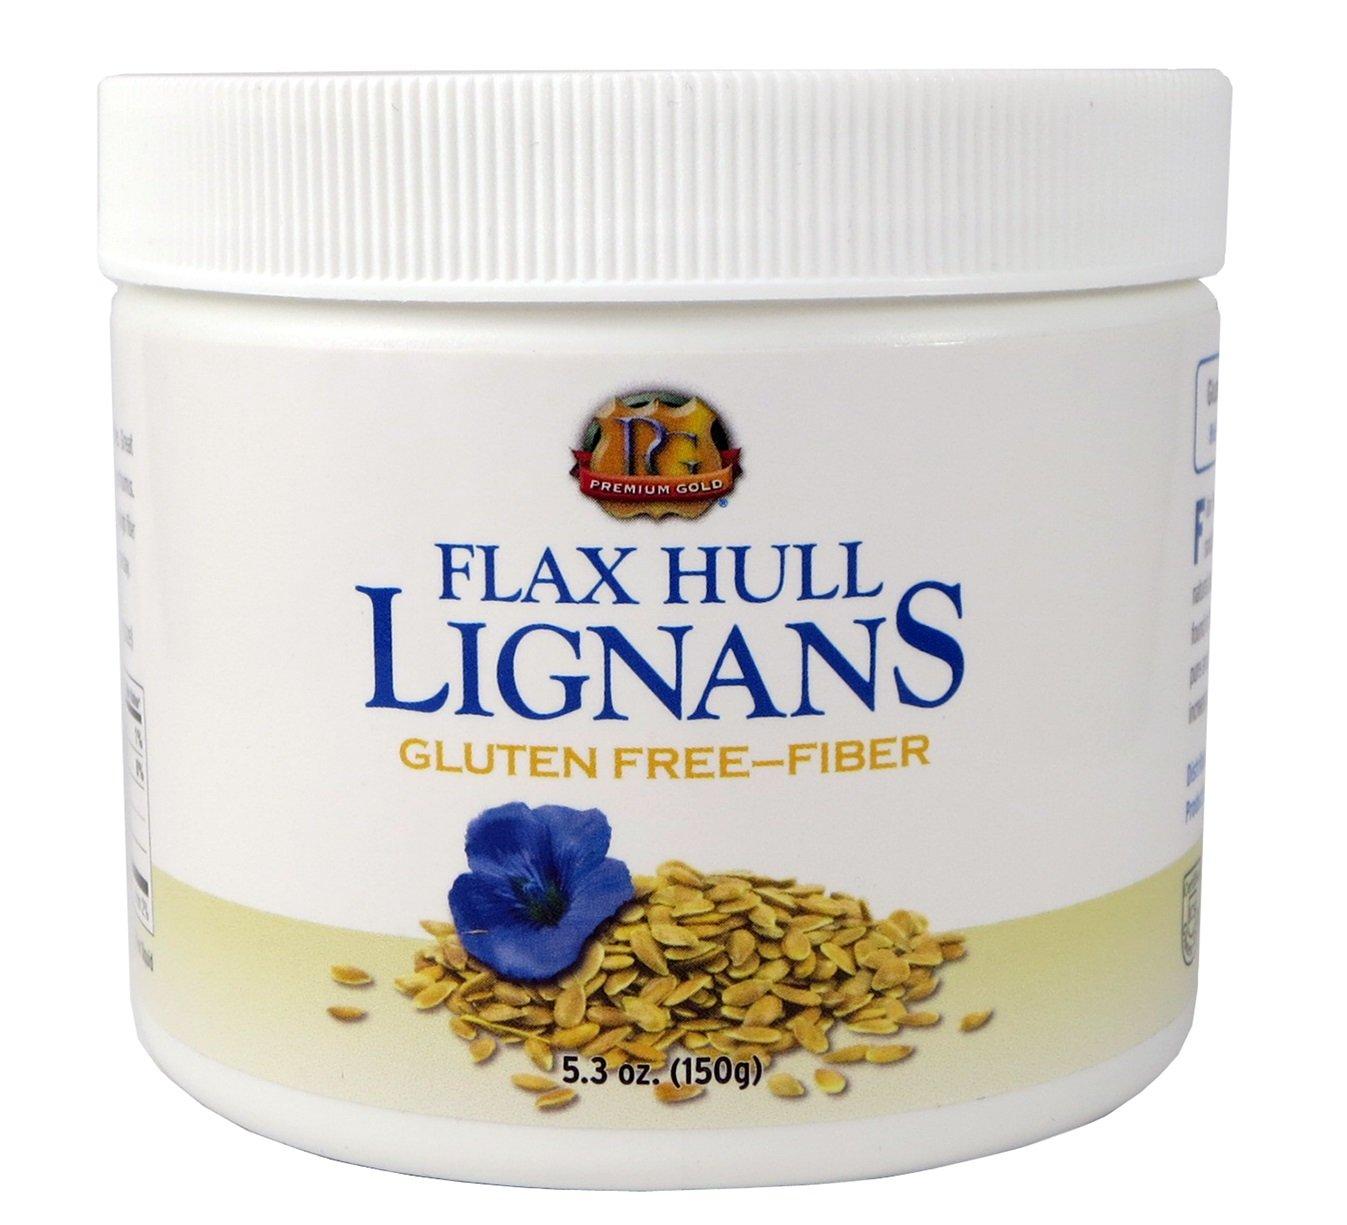 Premium Gold Lignans | High Fiber Food | Omega 3 | 5.3oz 2pk